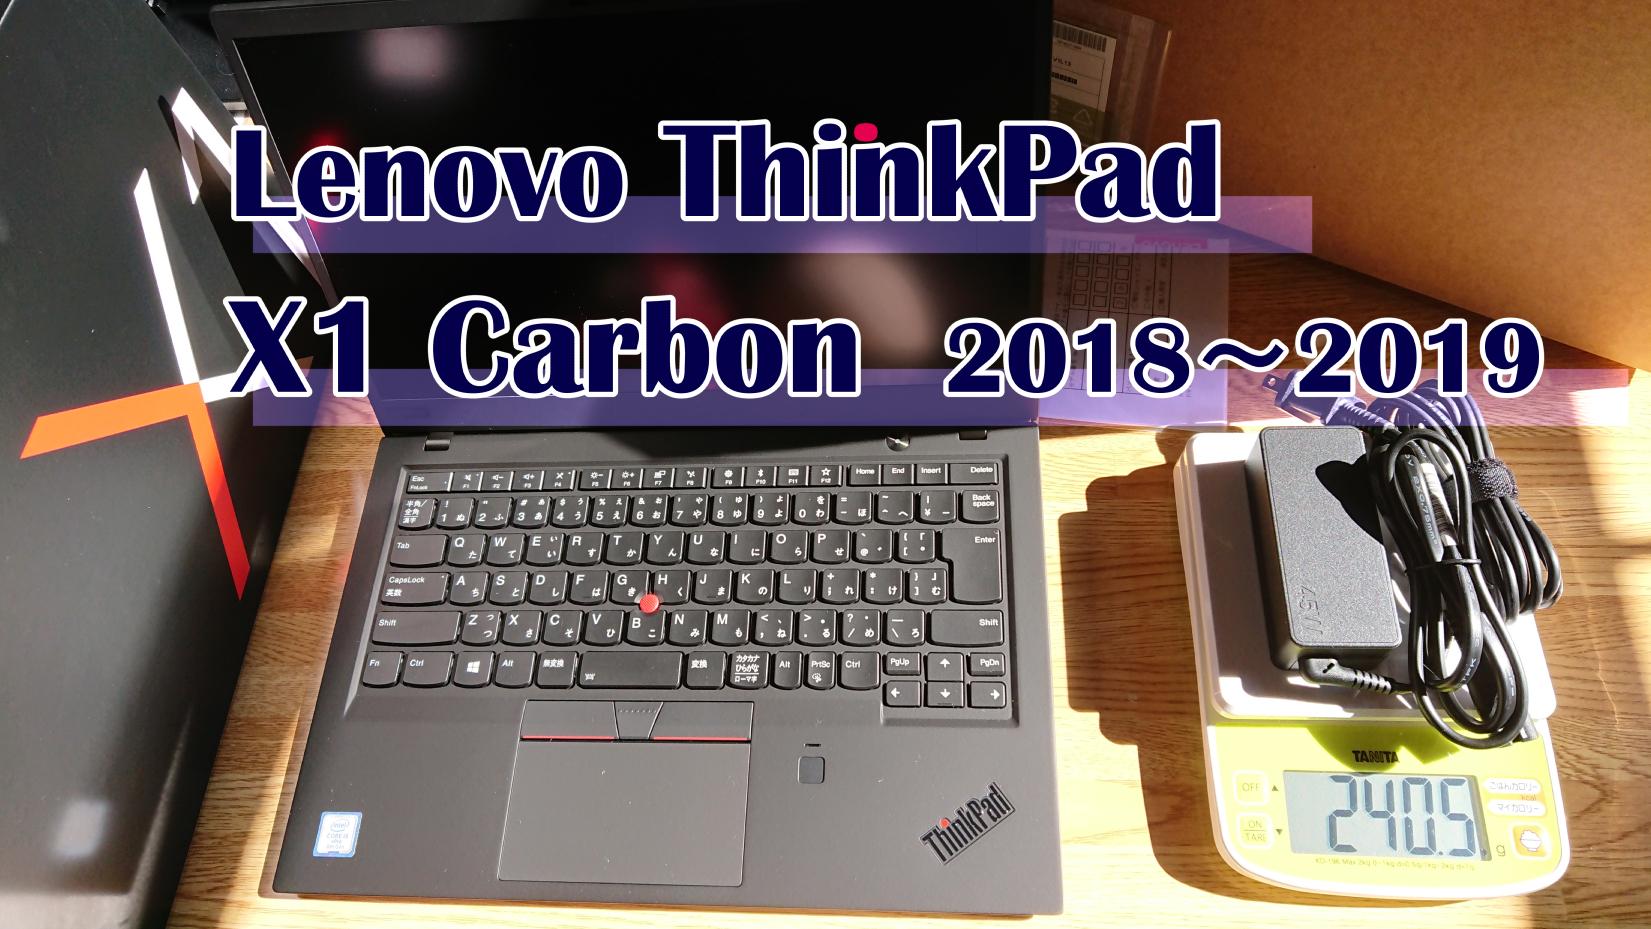 Lenovoのフラグシップモデル、ThinkPad X1 Carbonという名機